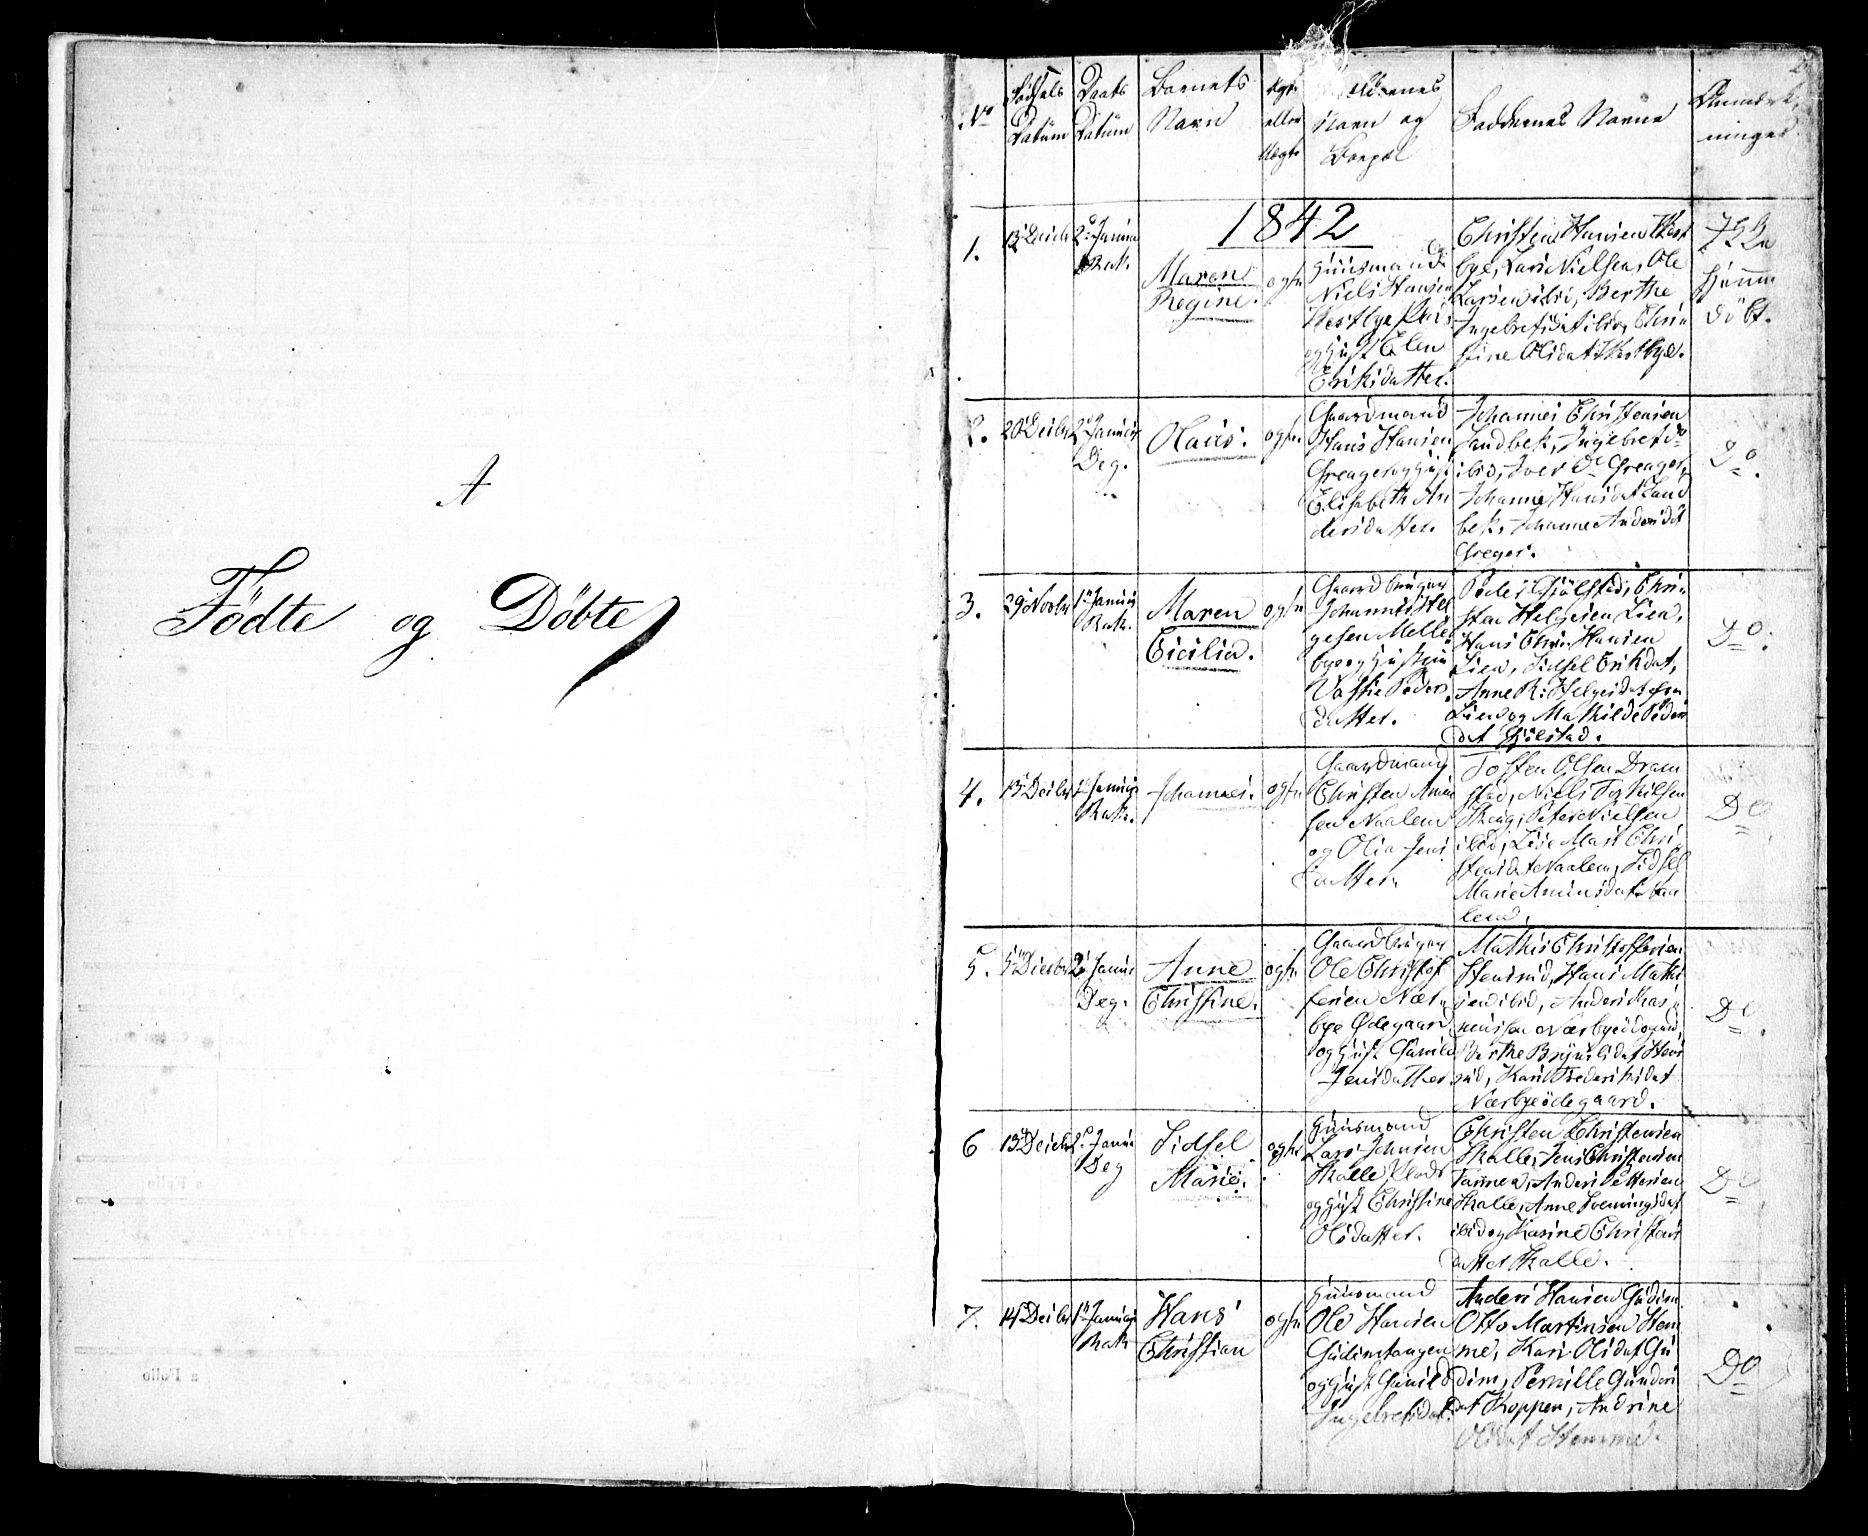 SAO, Rakkestad prestekontor Kirkebøker, F/Fa/L0008: Ministerialbok nr. I 8, 1842-1849, s. 2